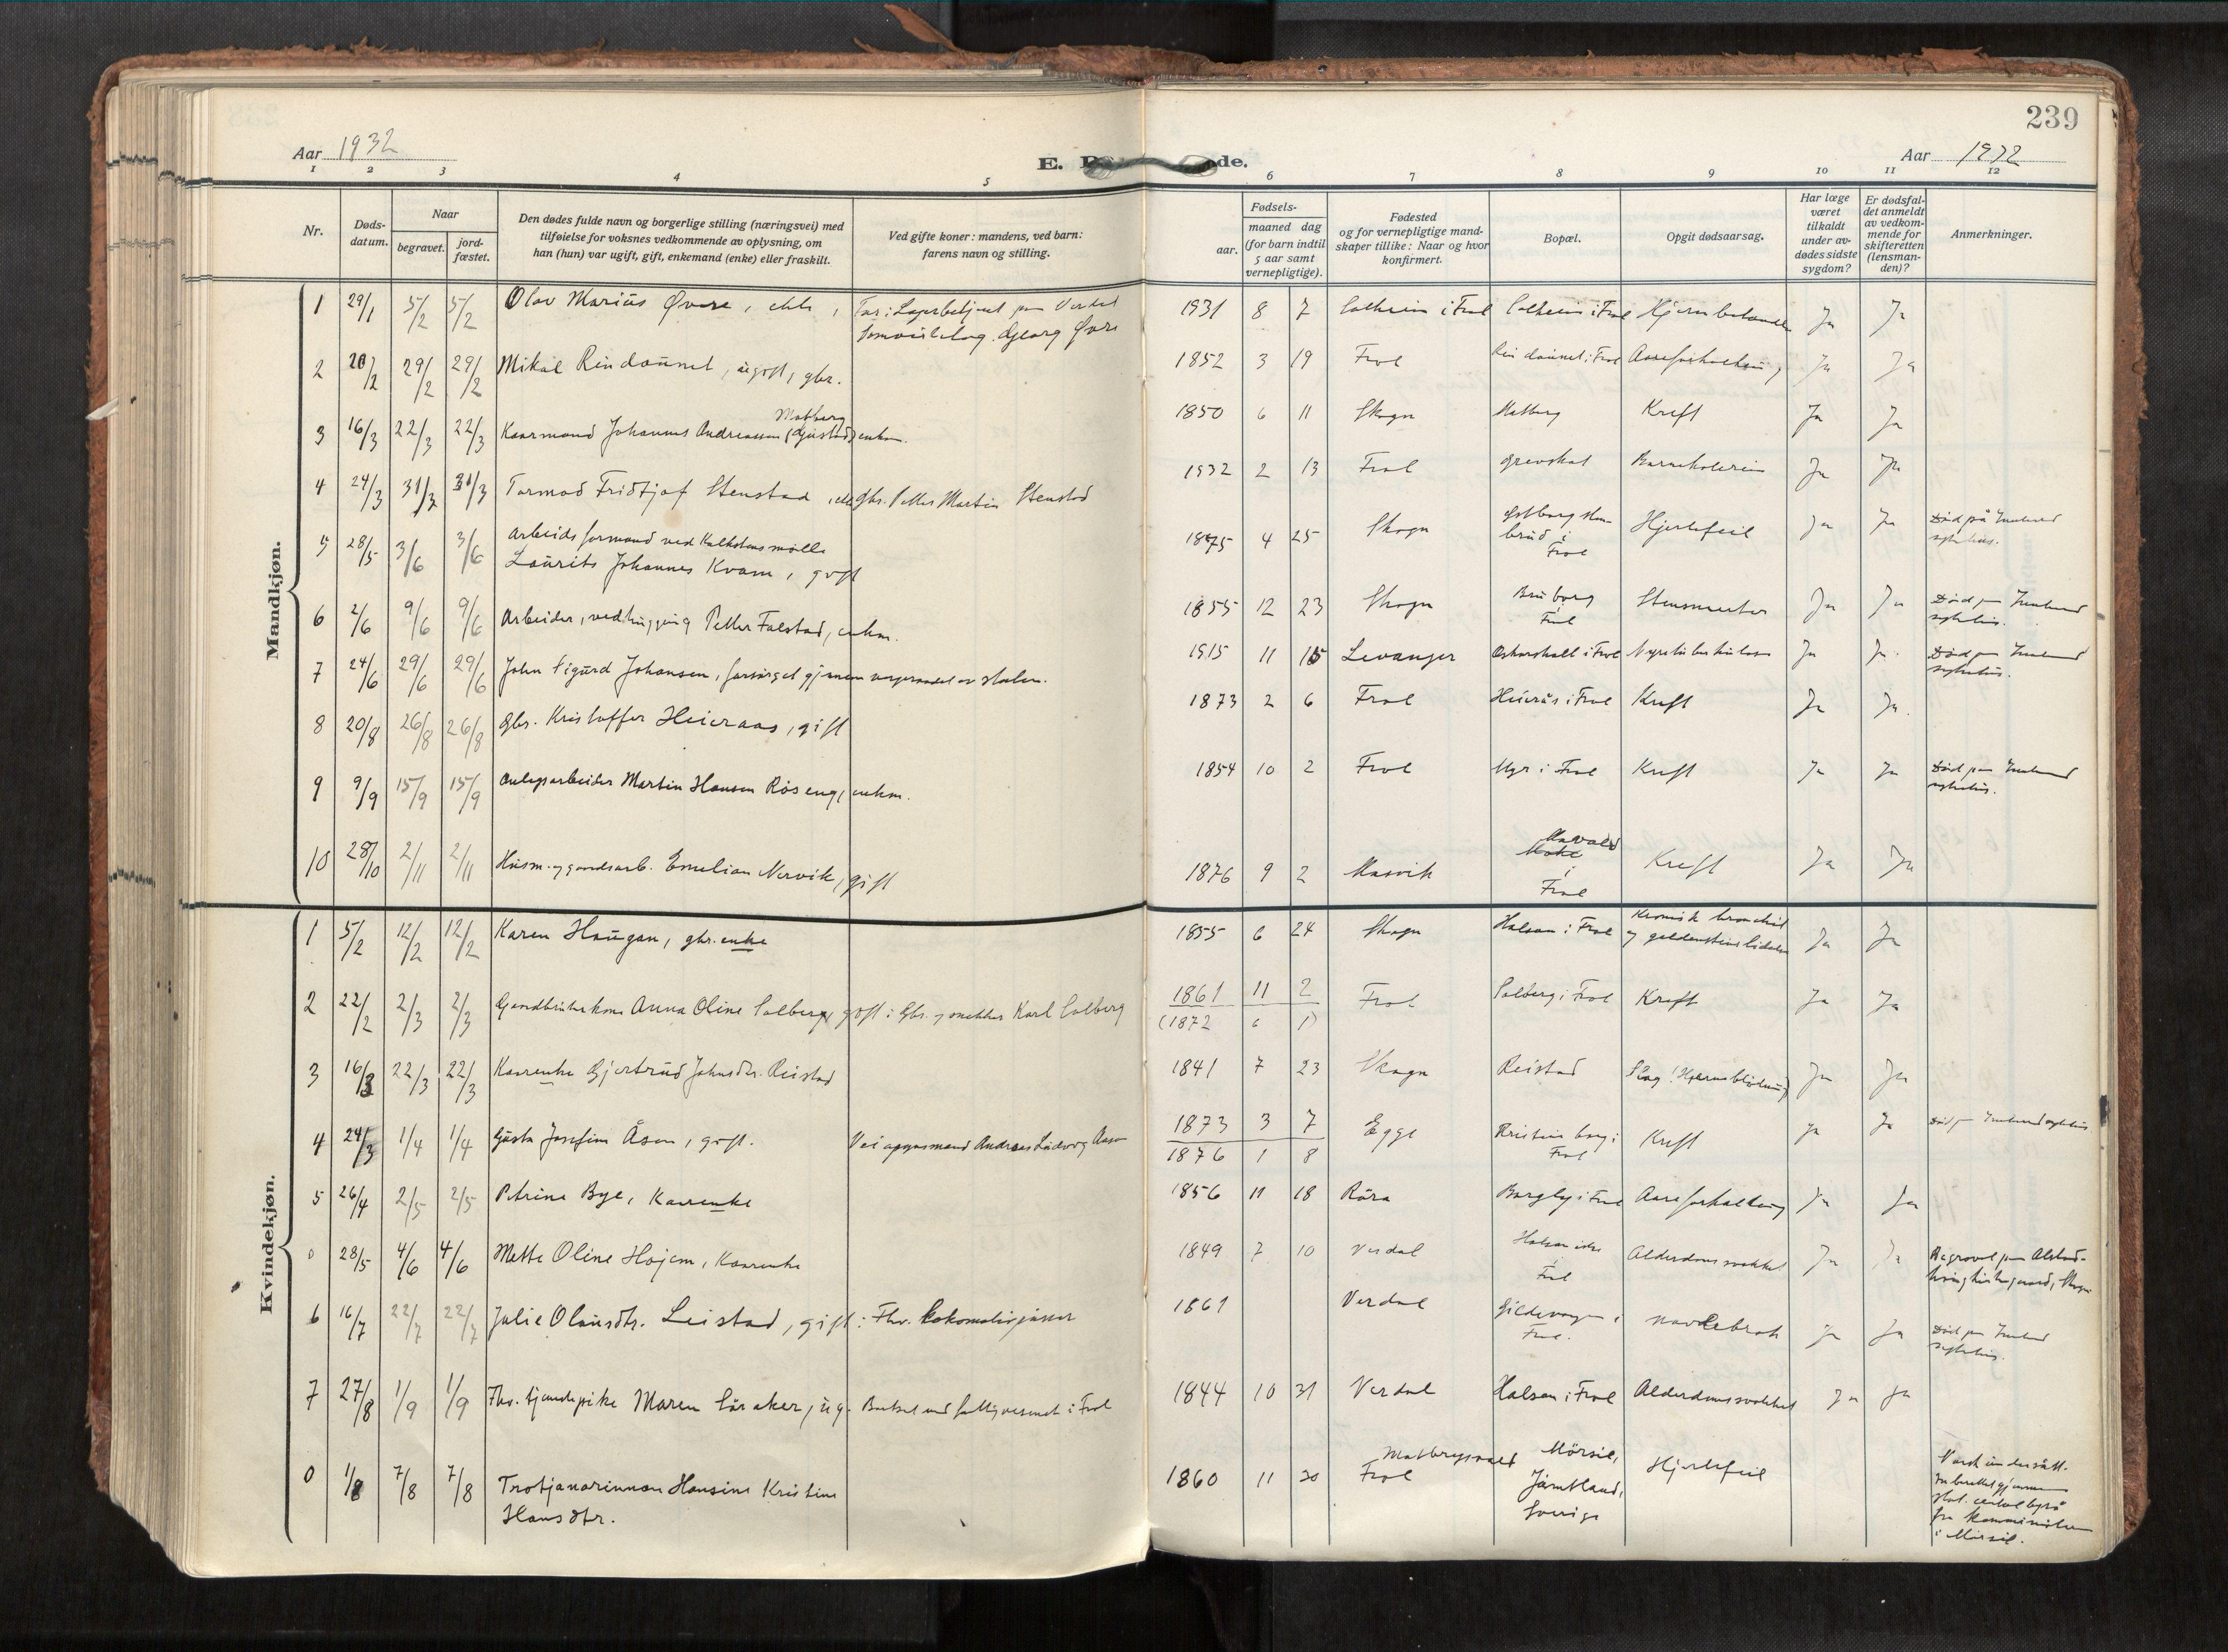 SAT, Levanger sokneprestkontor*, Parish register (official) no. 1, 1912-1935, p. 239